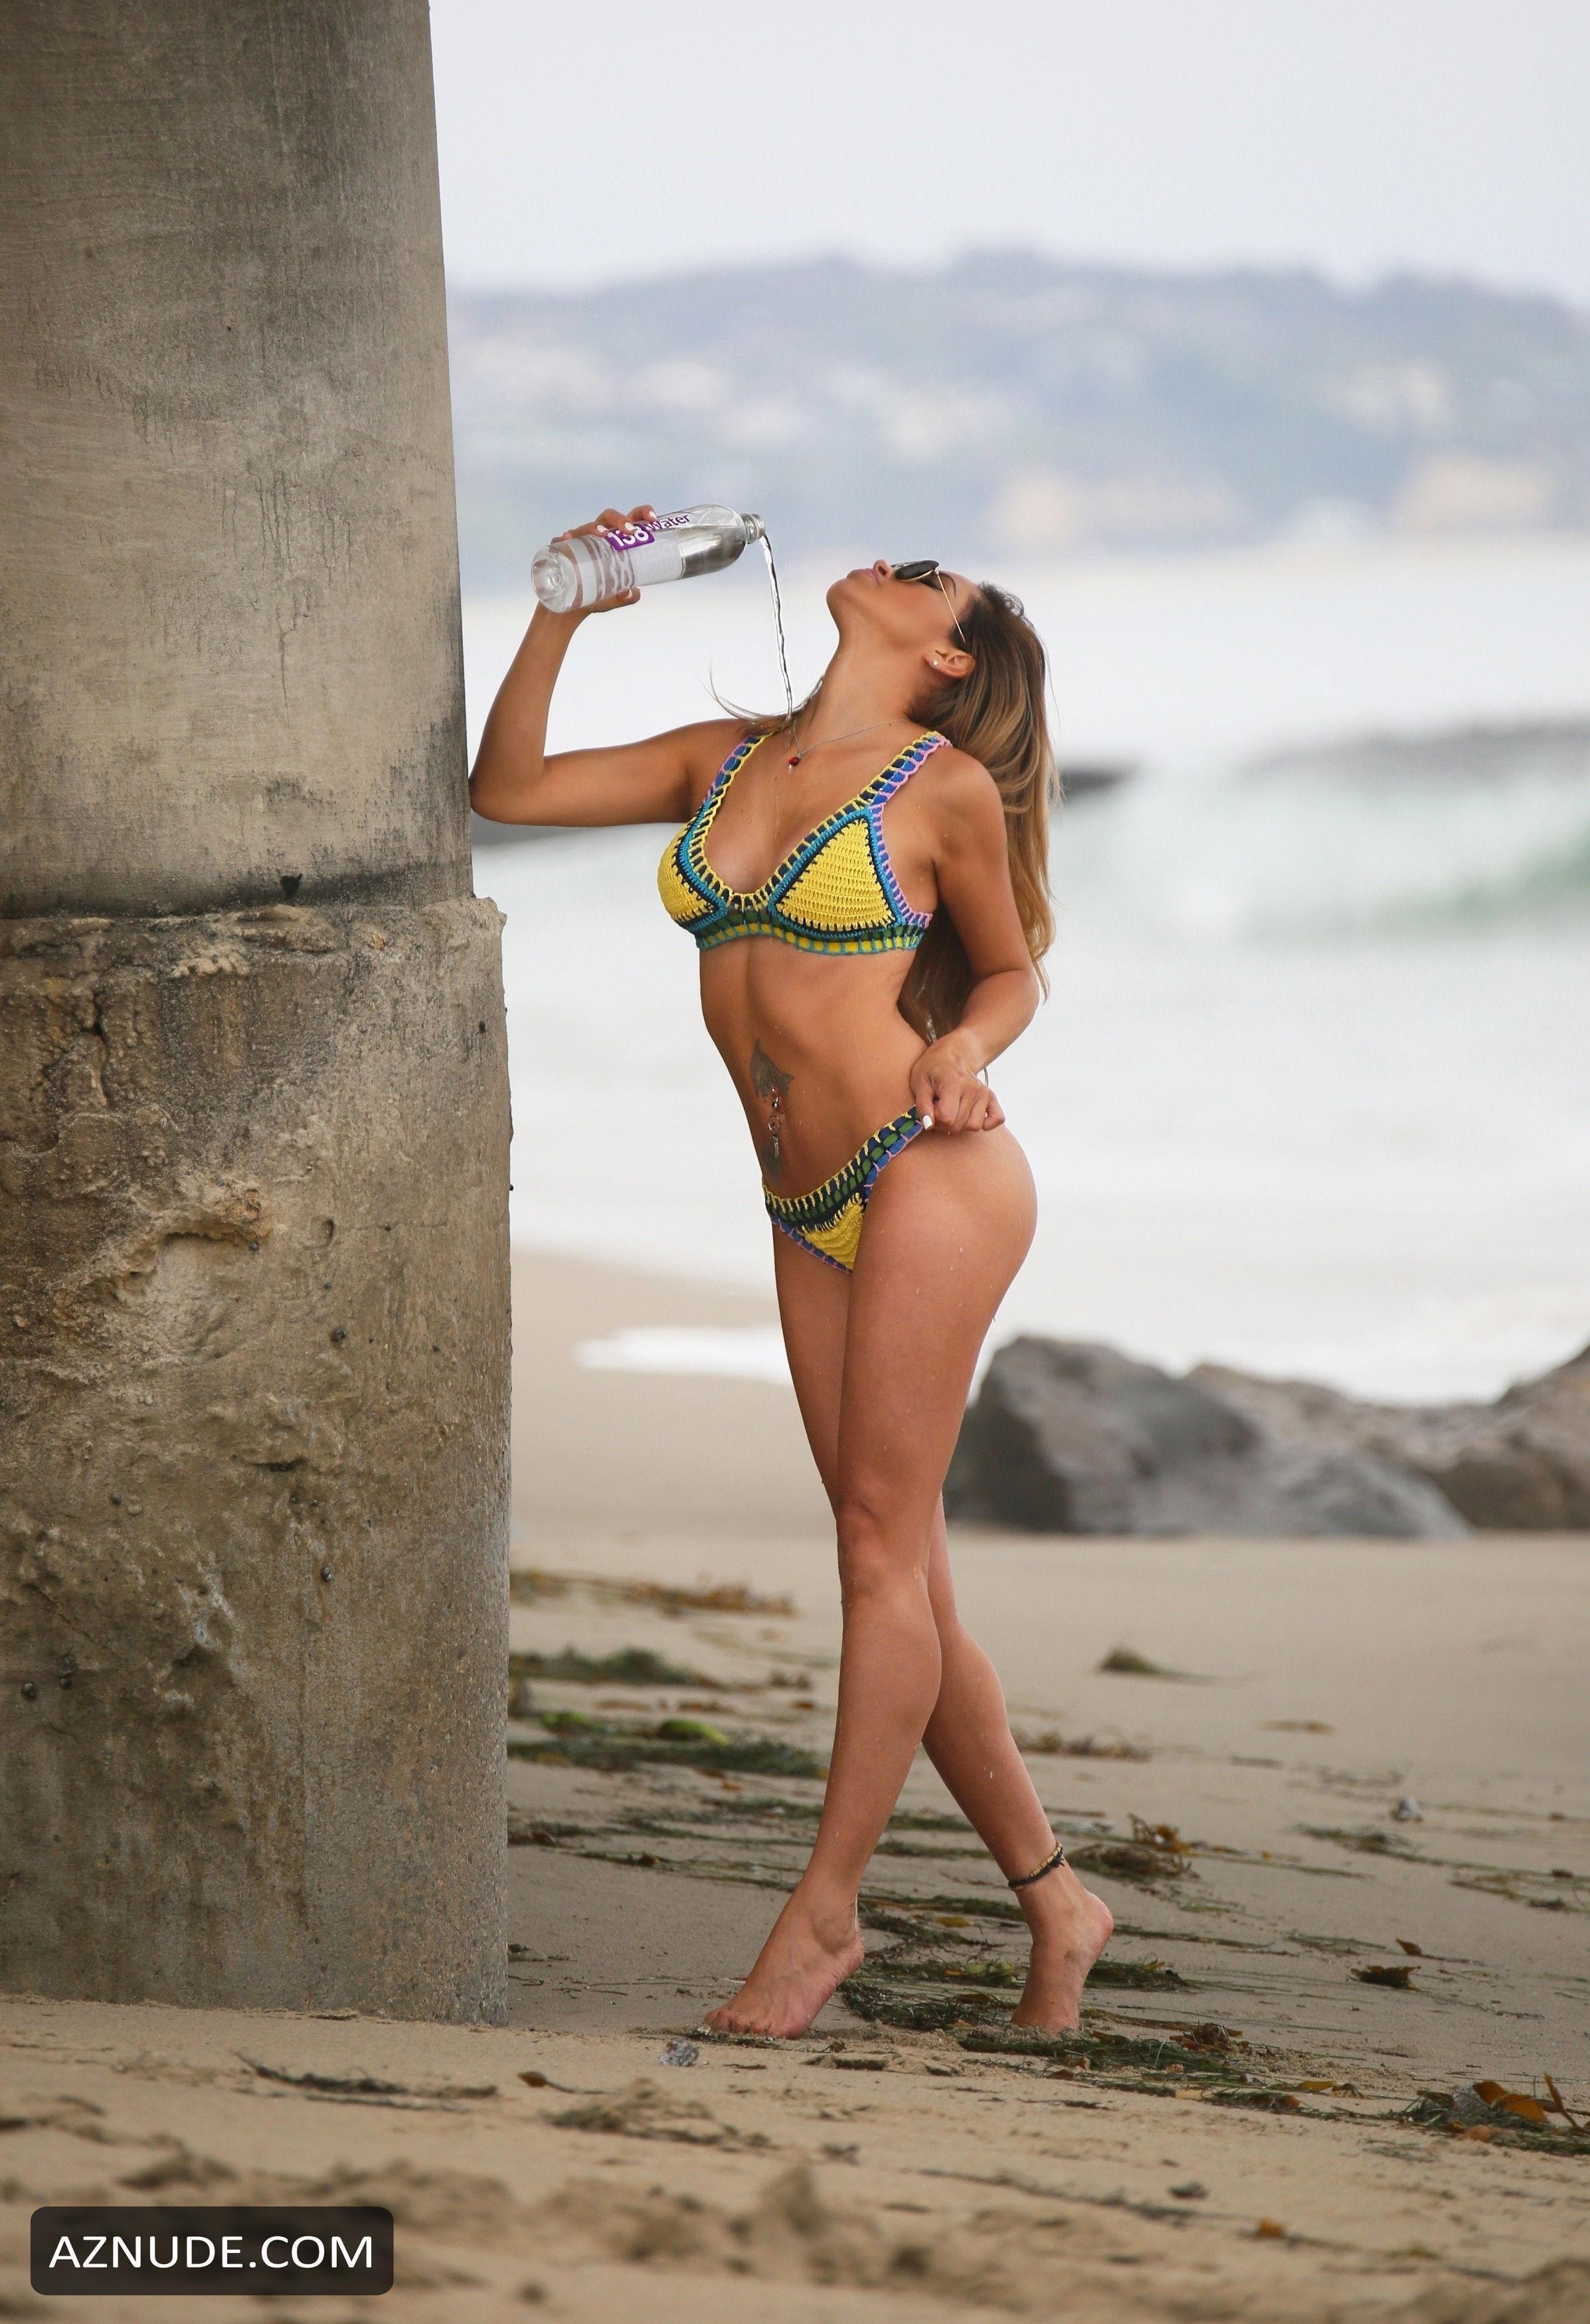 Ari Westphal Nude Photos and Videos new foto